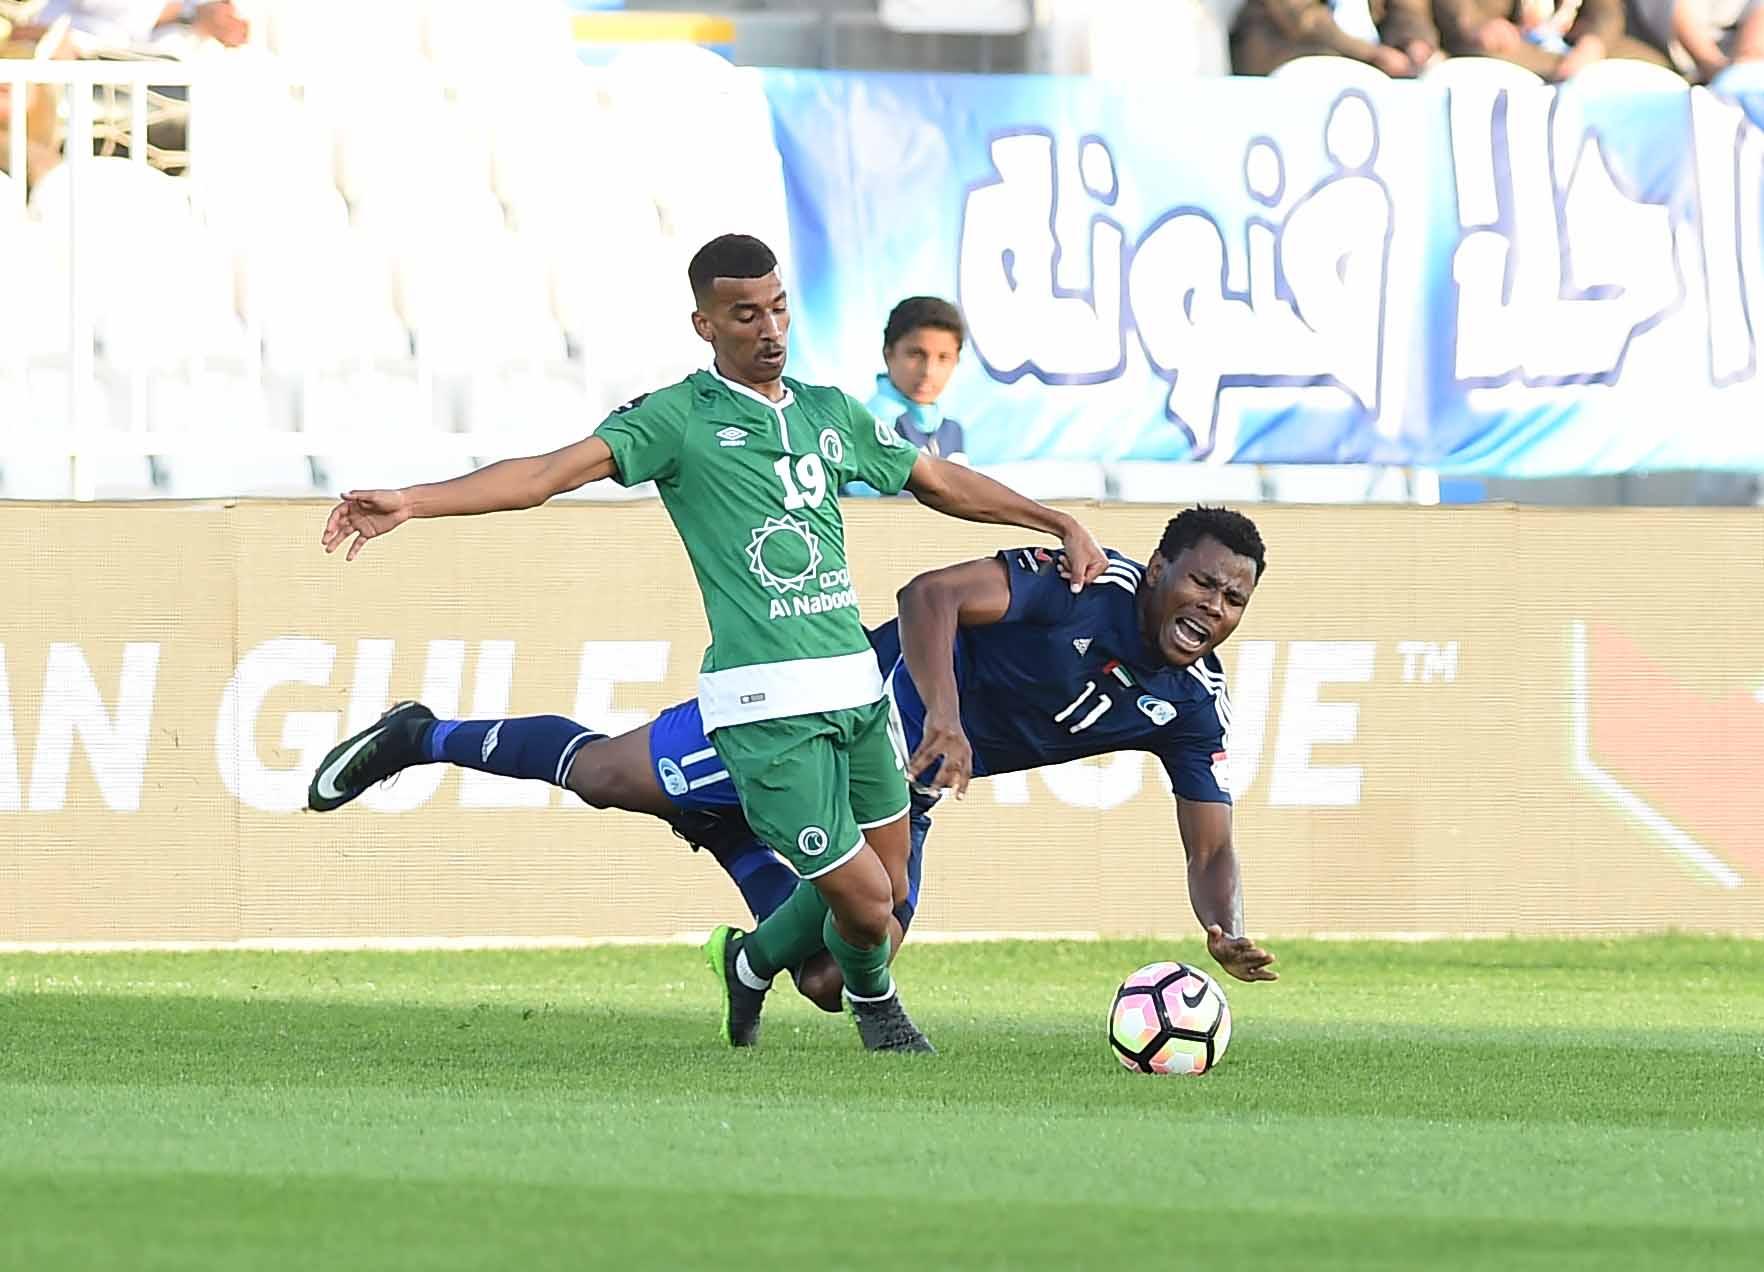 Baniyas vs Shabab AGL 16 2016-17